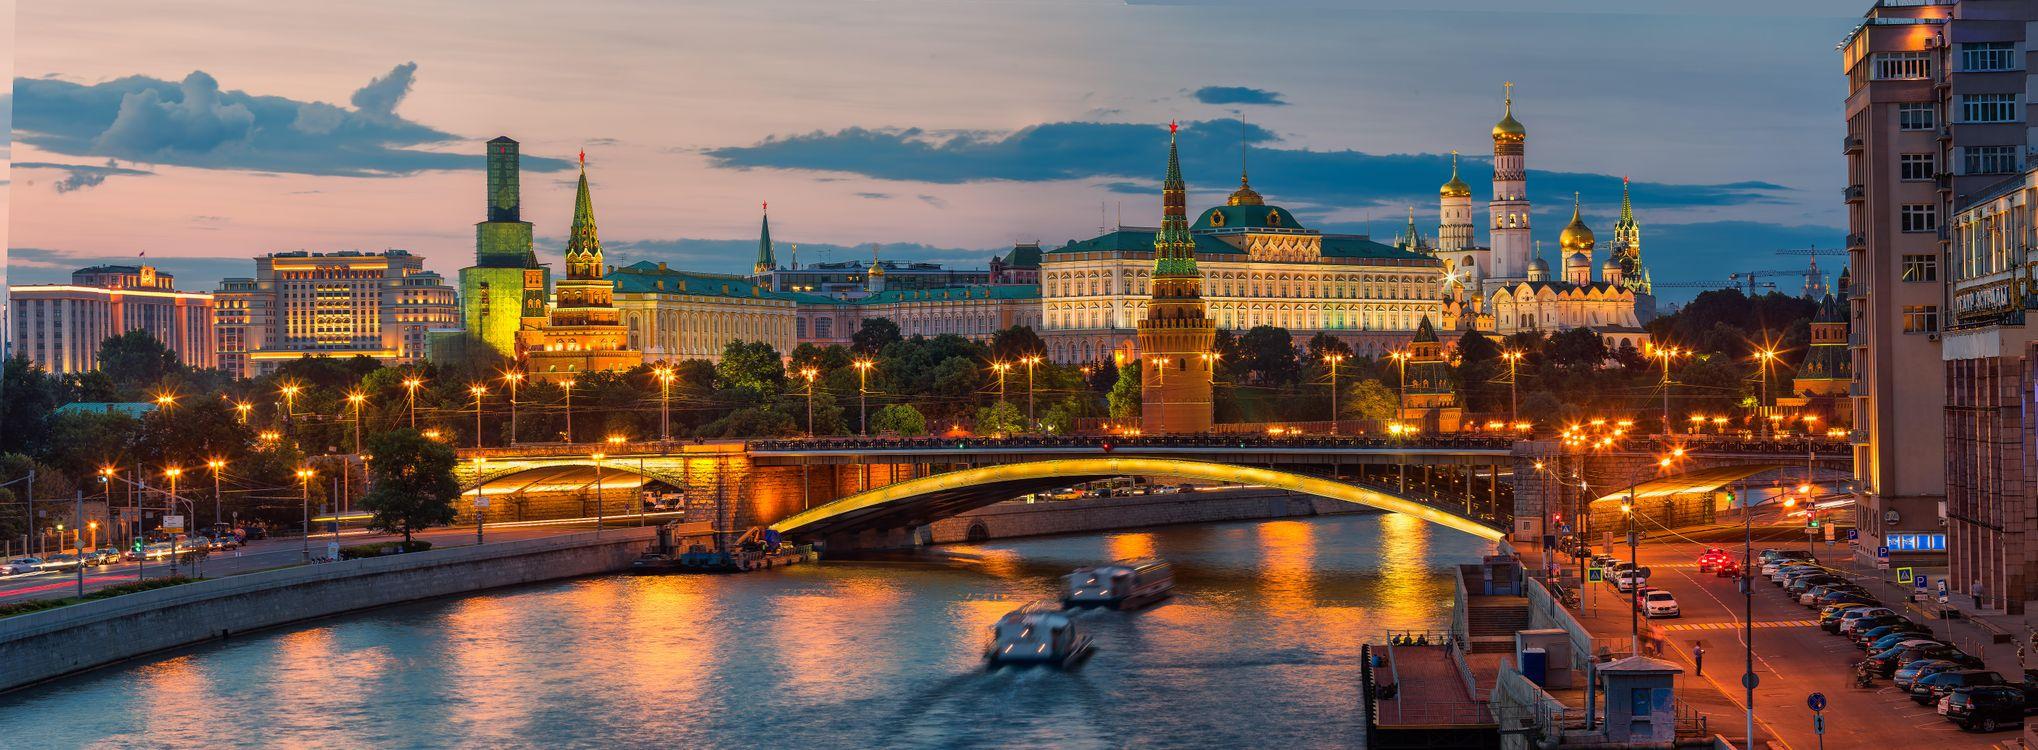 дополнена чертежами, картинки панорамы кремля гузеева